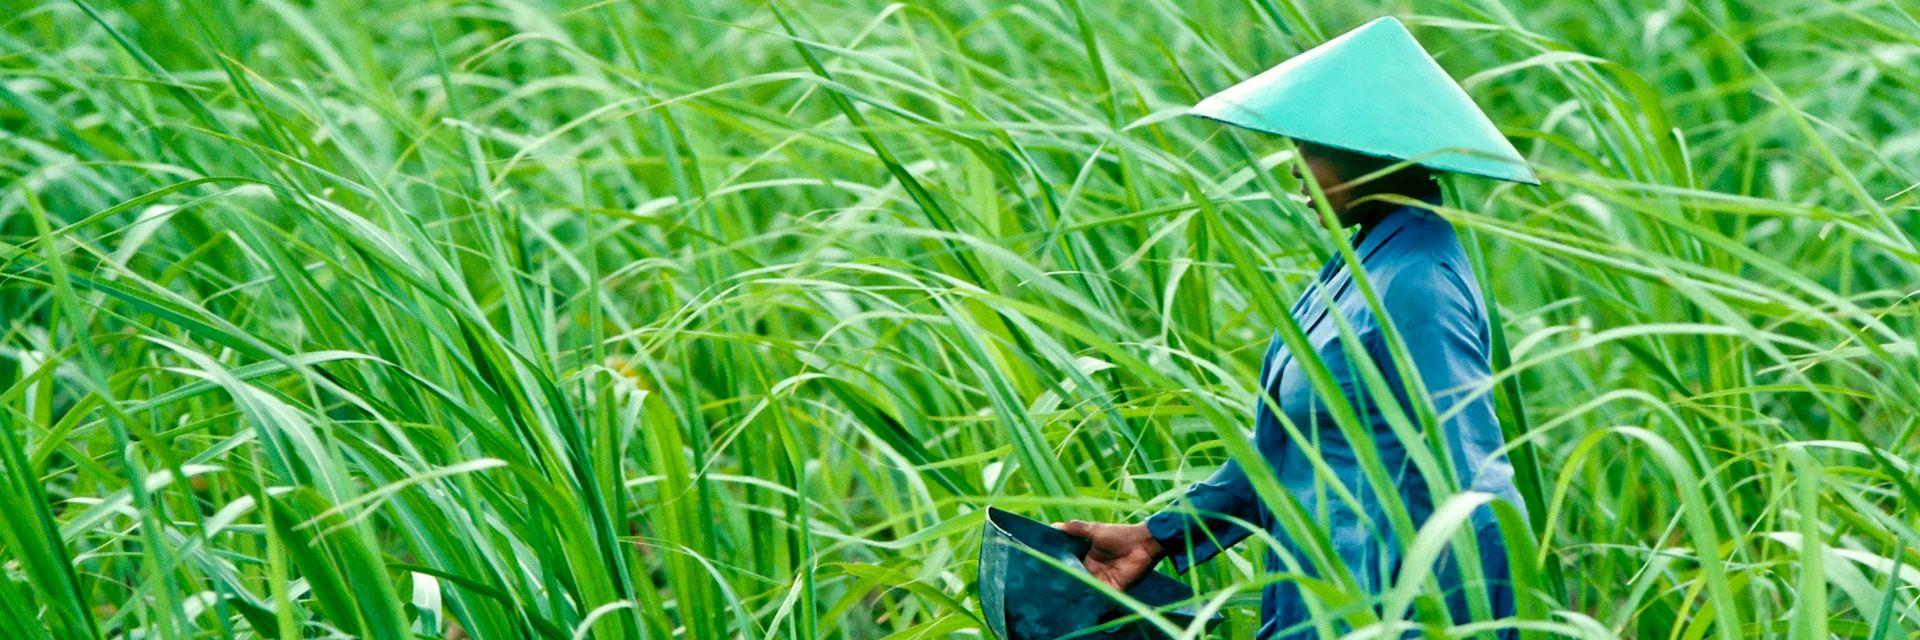 Fertilising a rice field in Vietnam